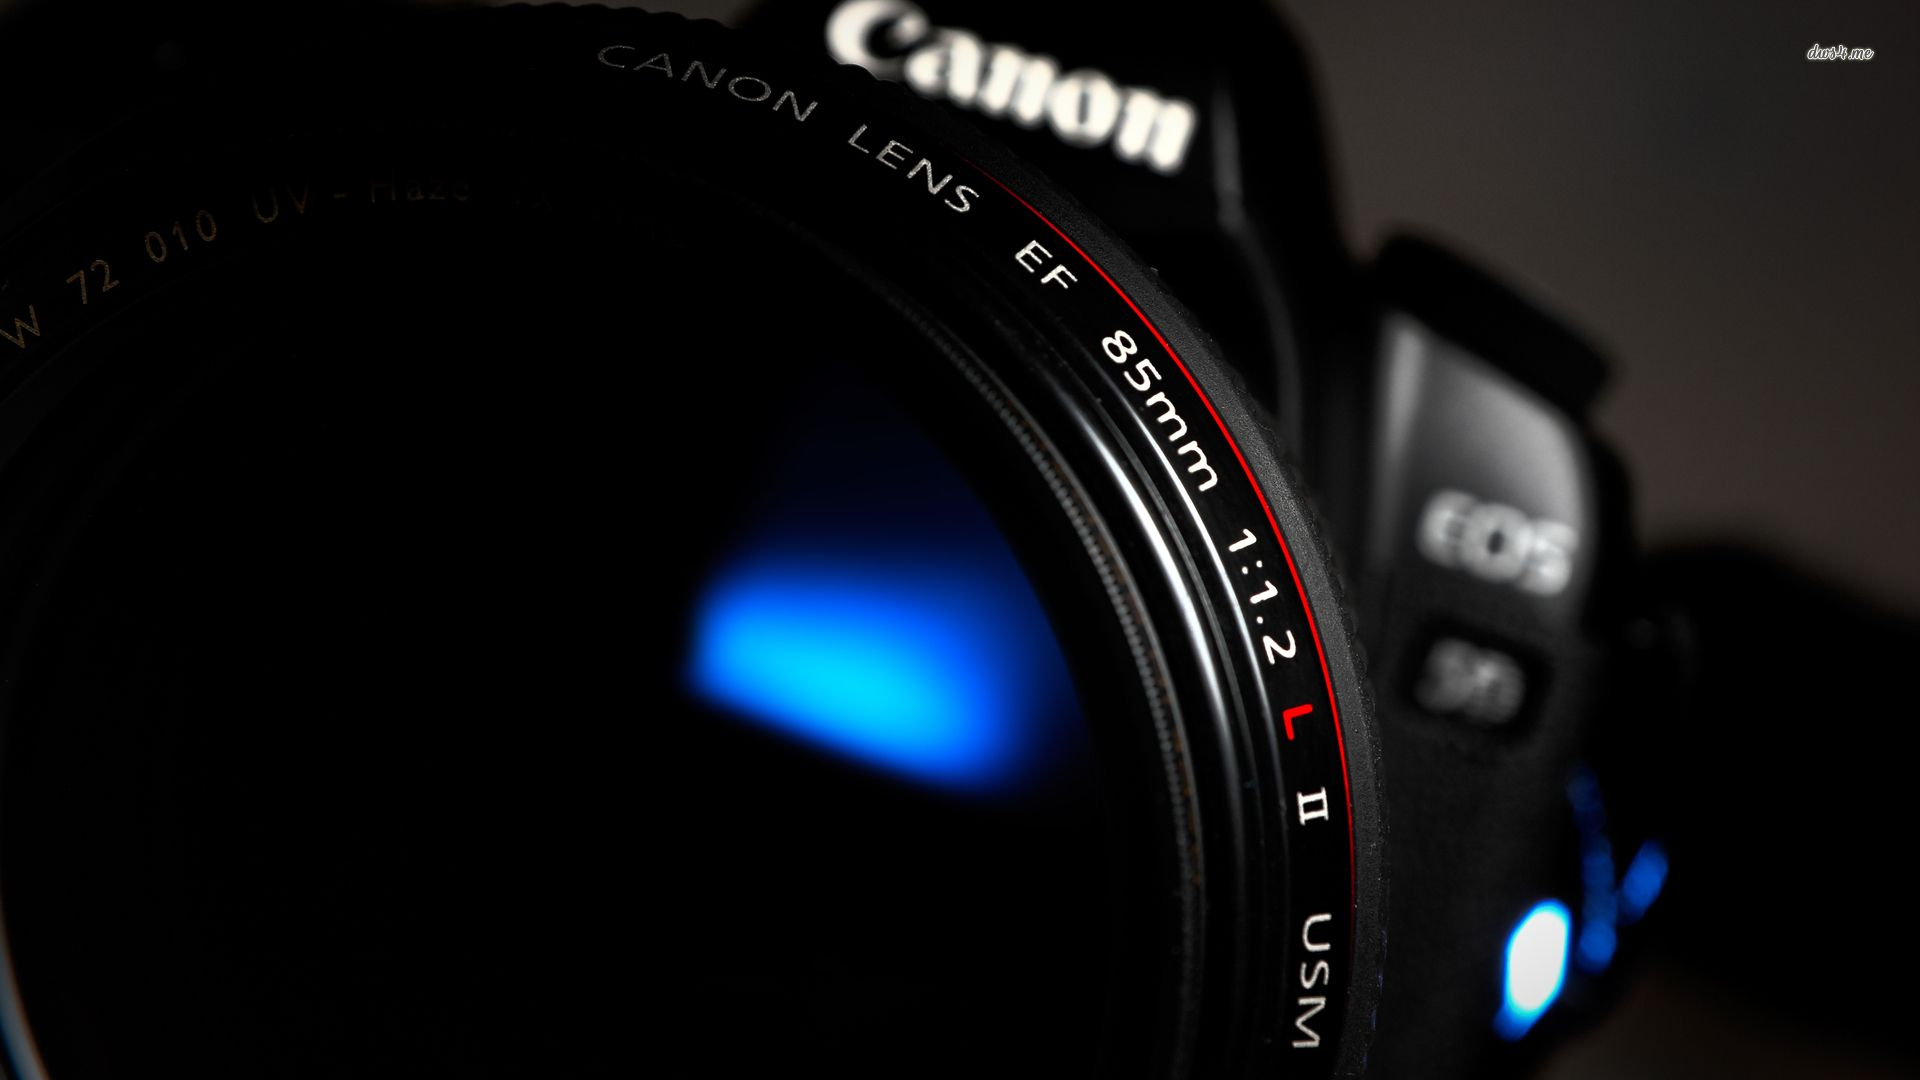 Dslr Lens For Iphone